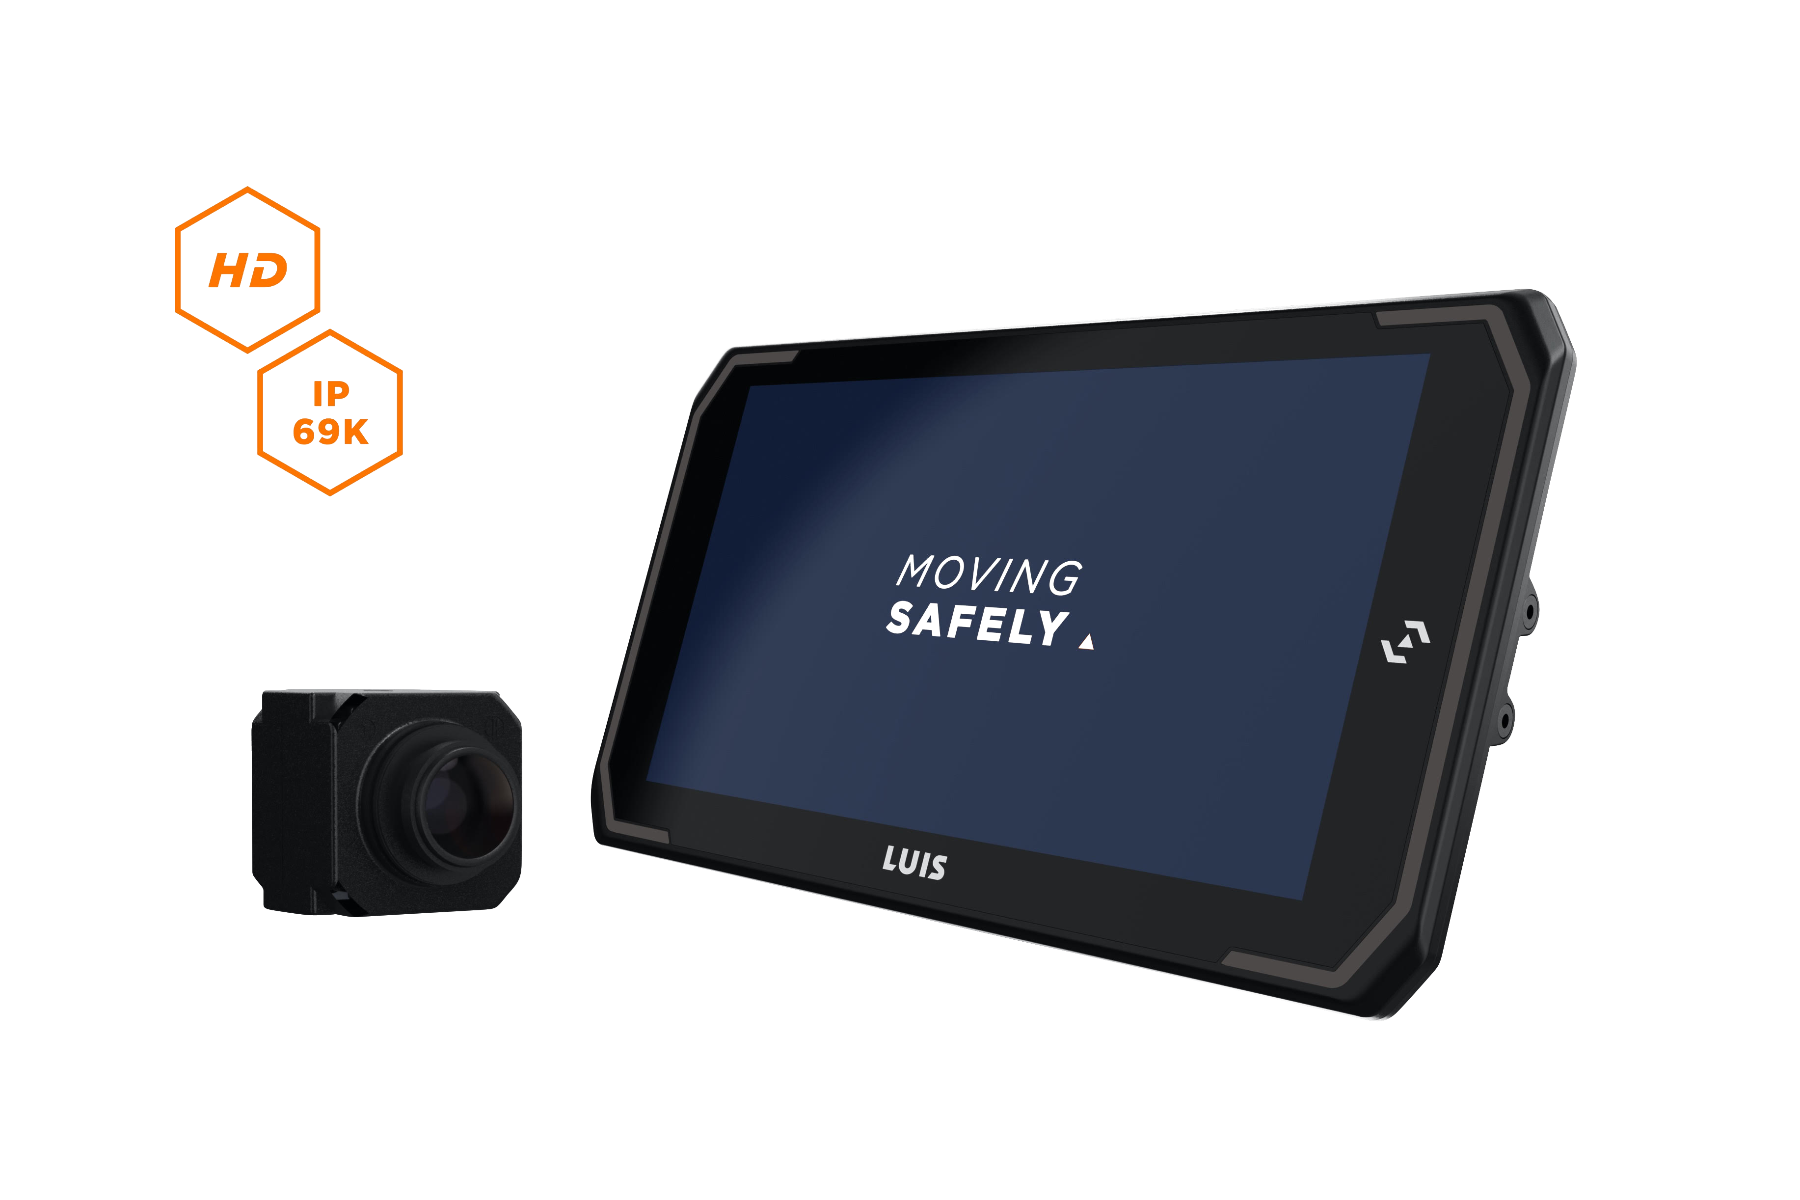 Kamera-Monitor-System